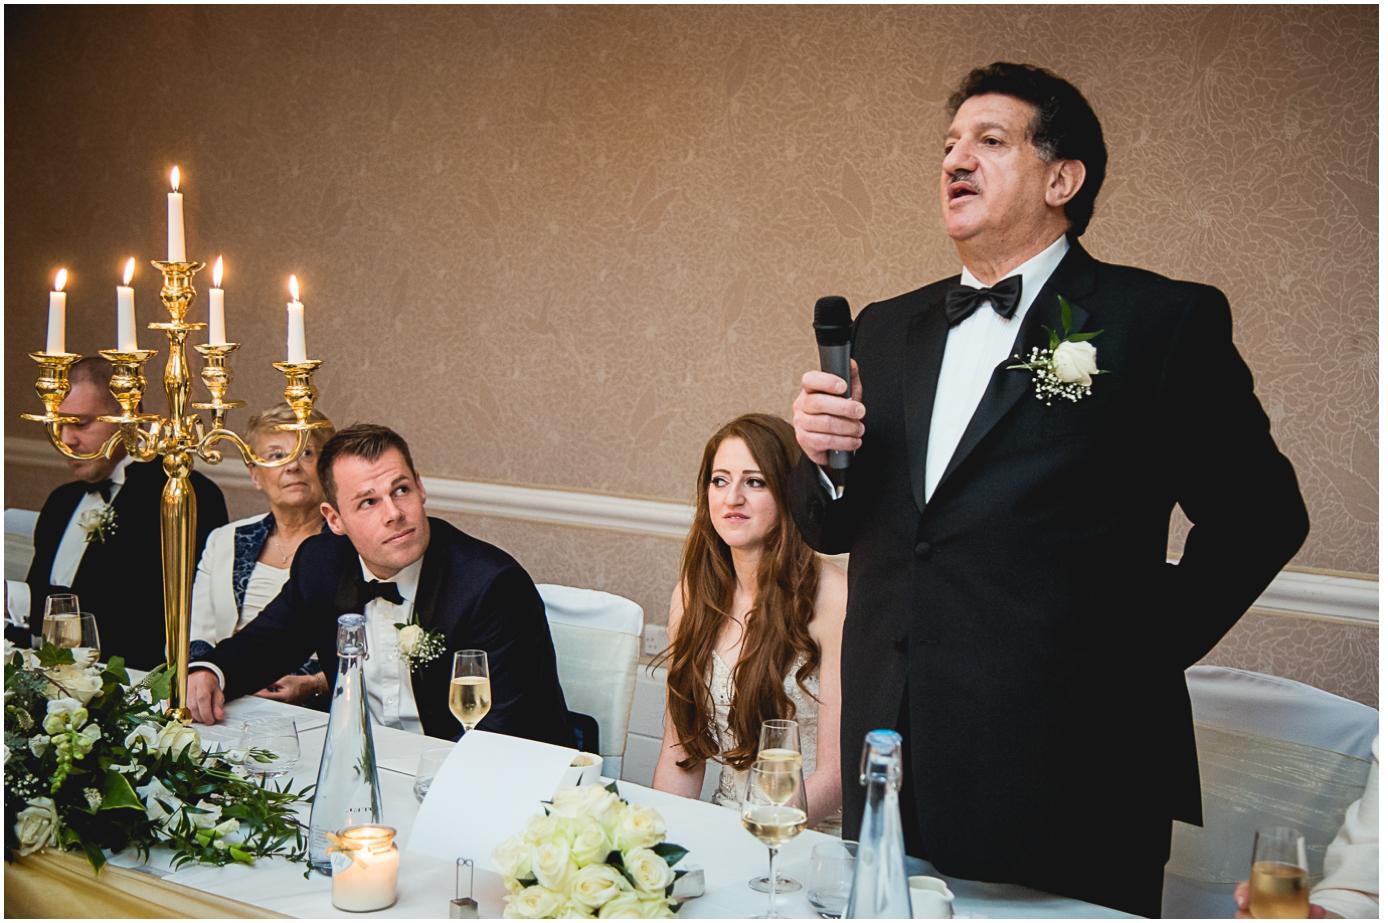 69 - Esmat and Angus - St. Ermin's Hotel London wedding photographer